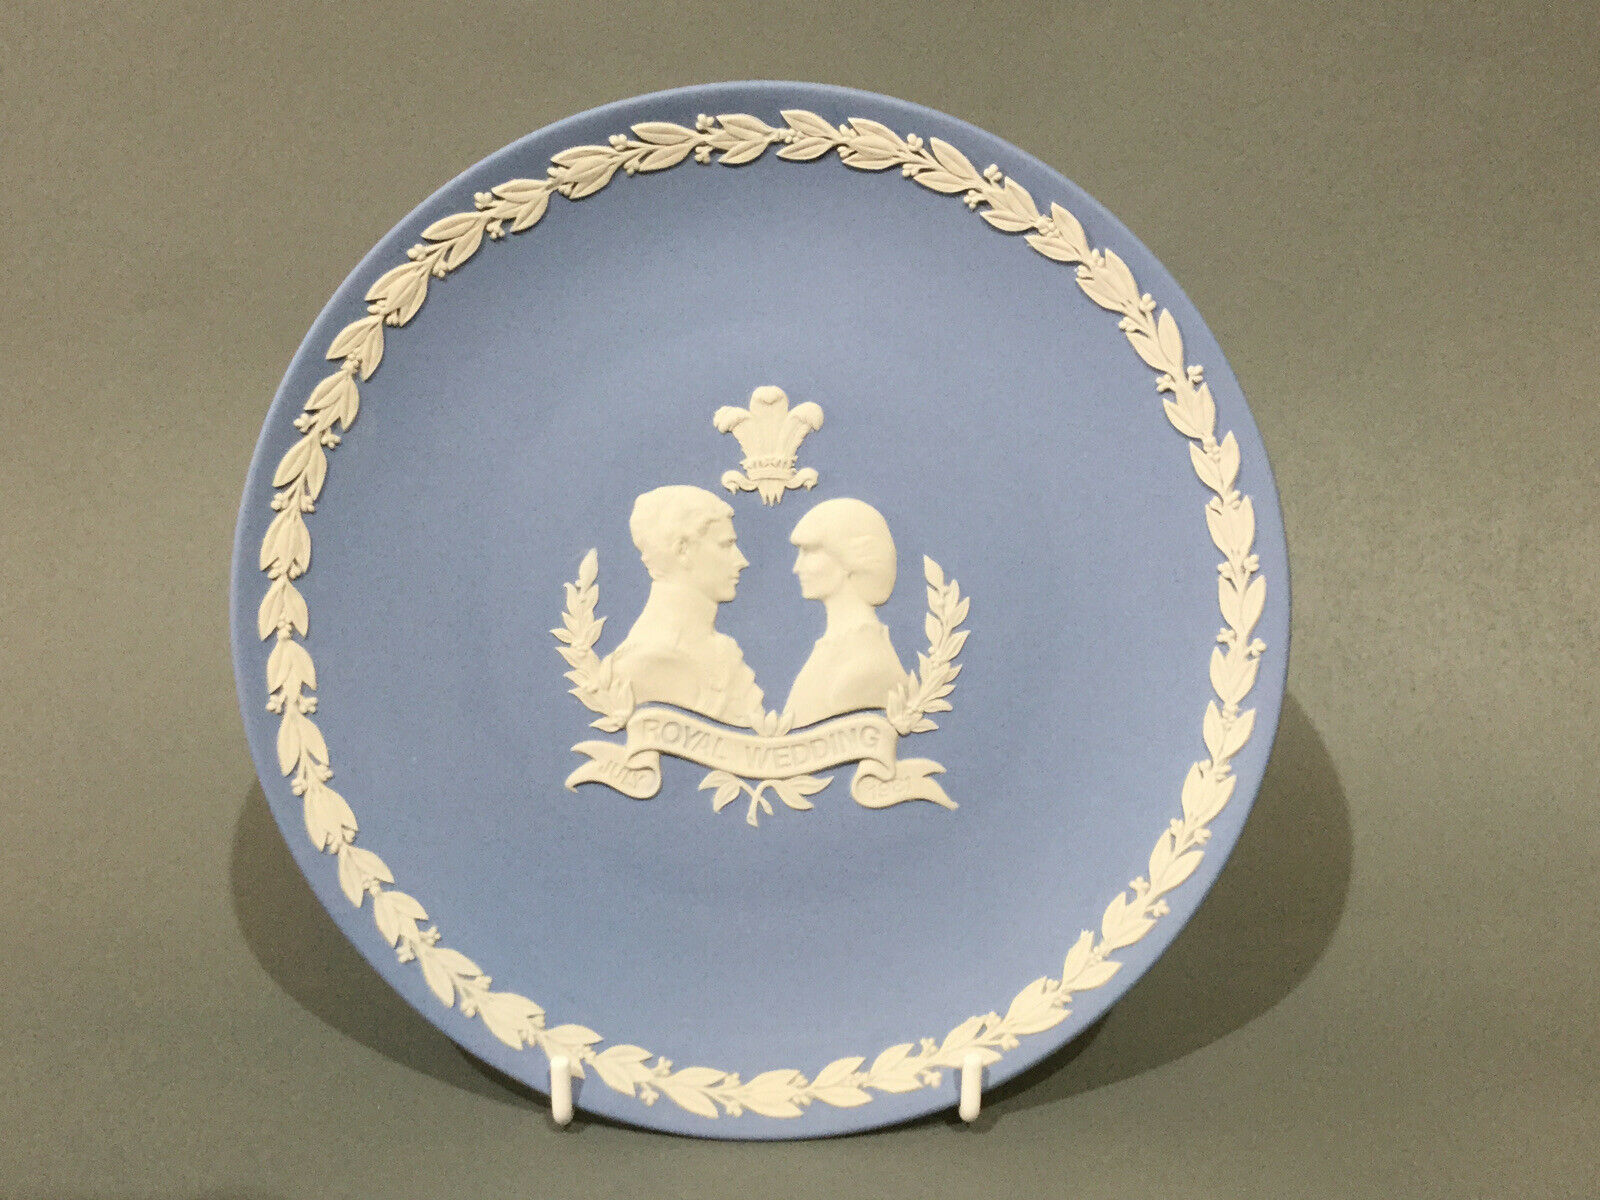 "Image 1 - Wedgwood Jasper Ware Collectors Plate "" Royal Wedding 1981 """